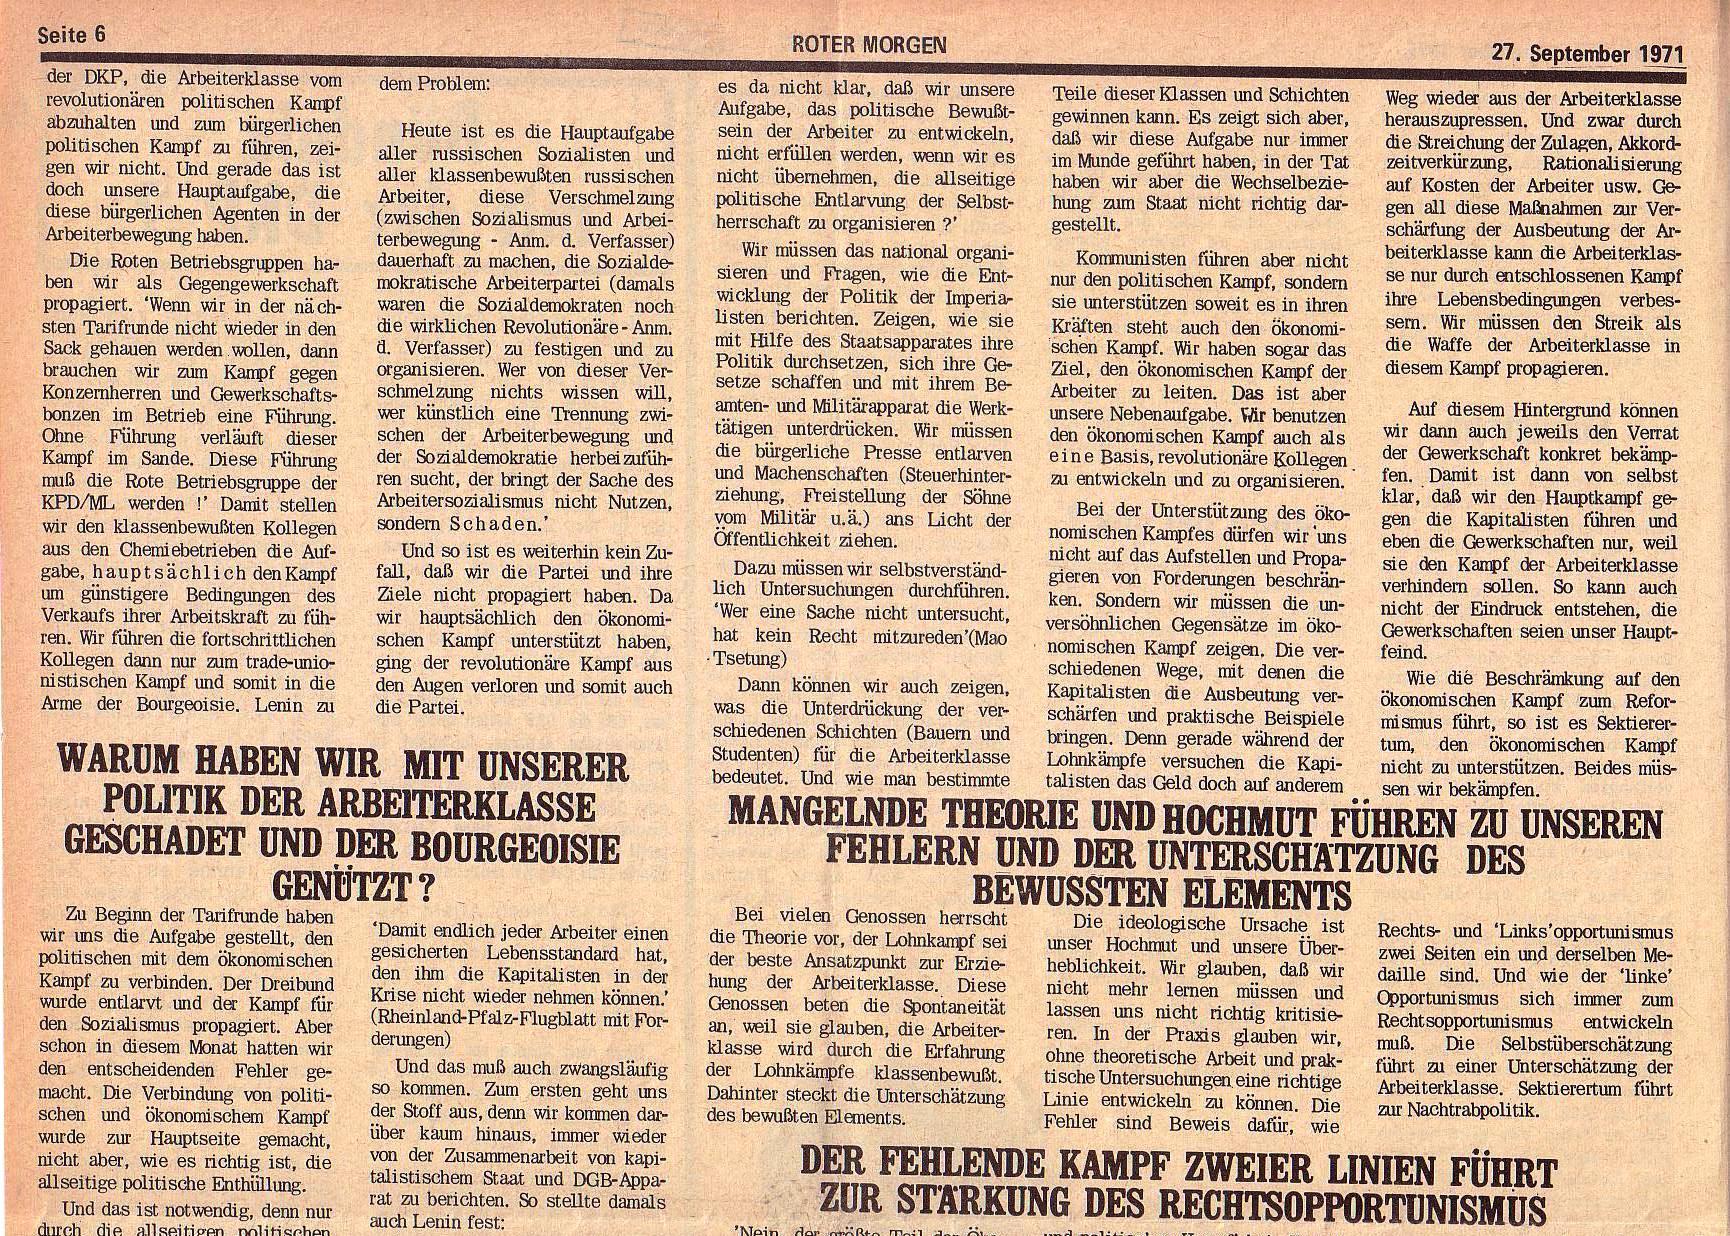 Roter Morgen, 5. Jg., 27. September 1971, Nr. 10, Seite 6a